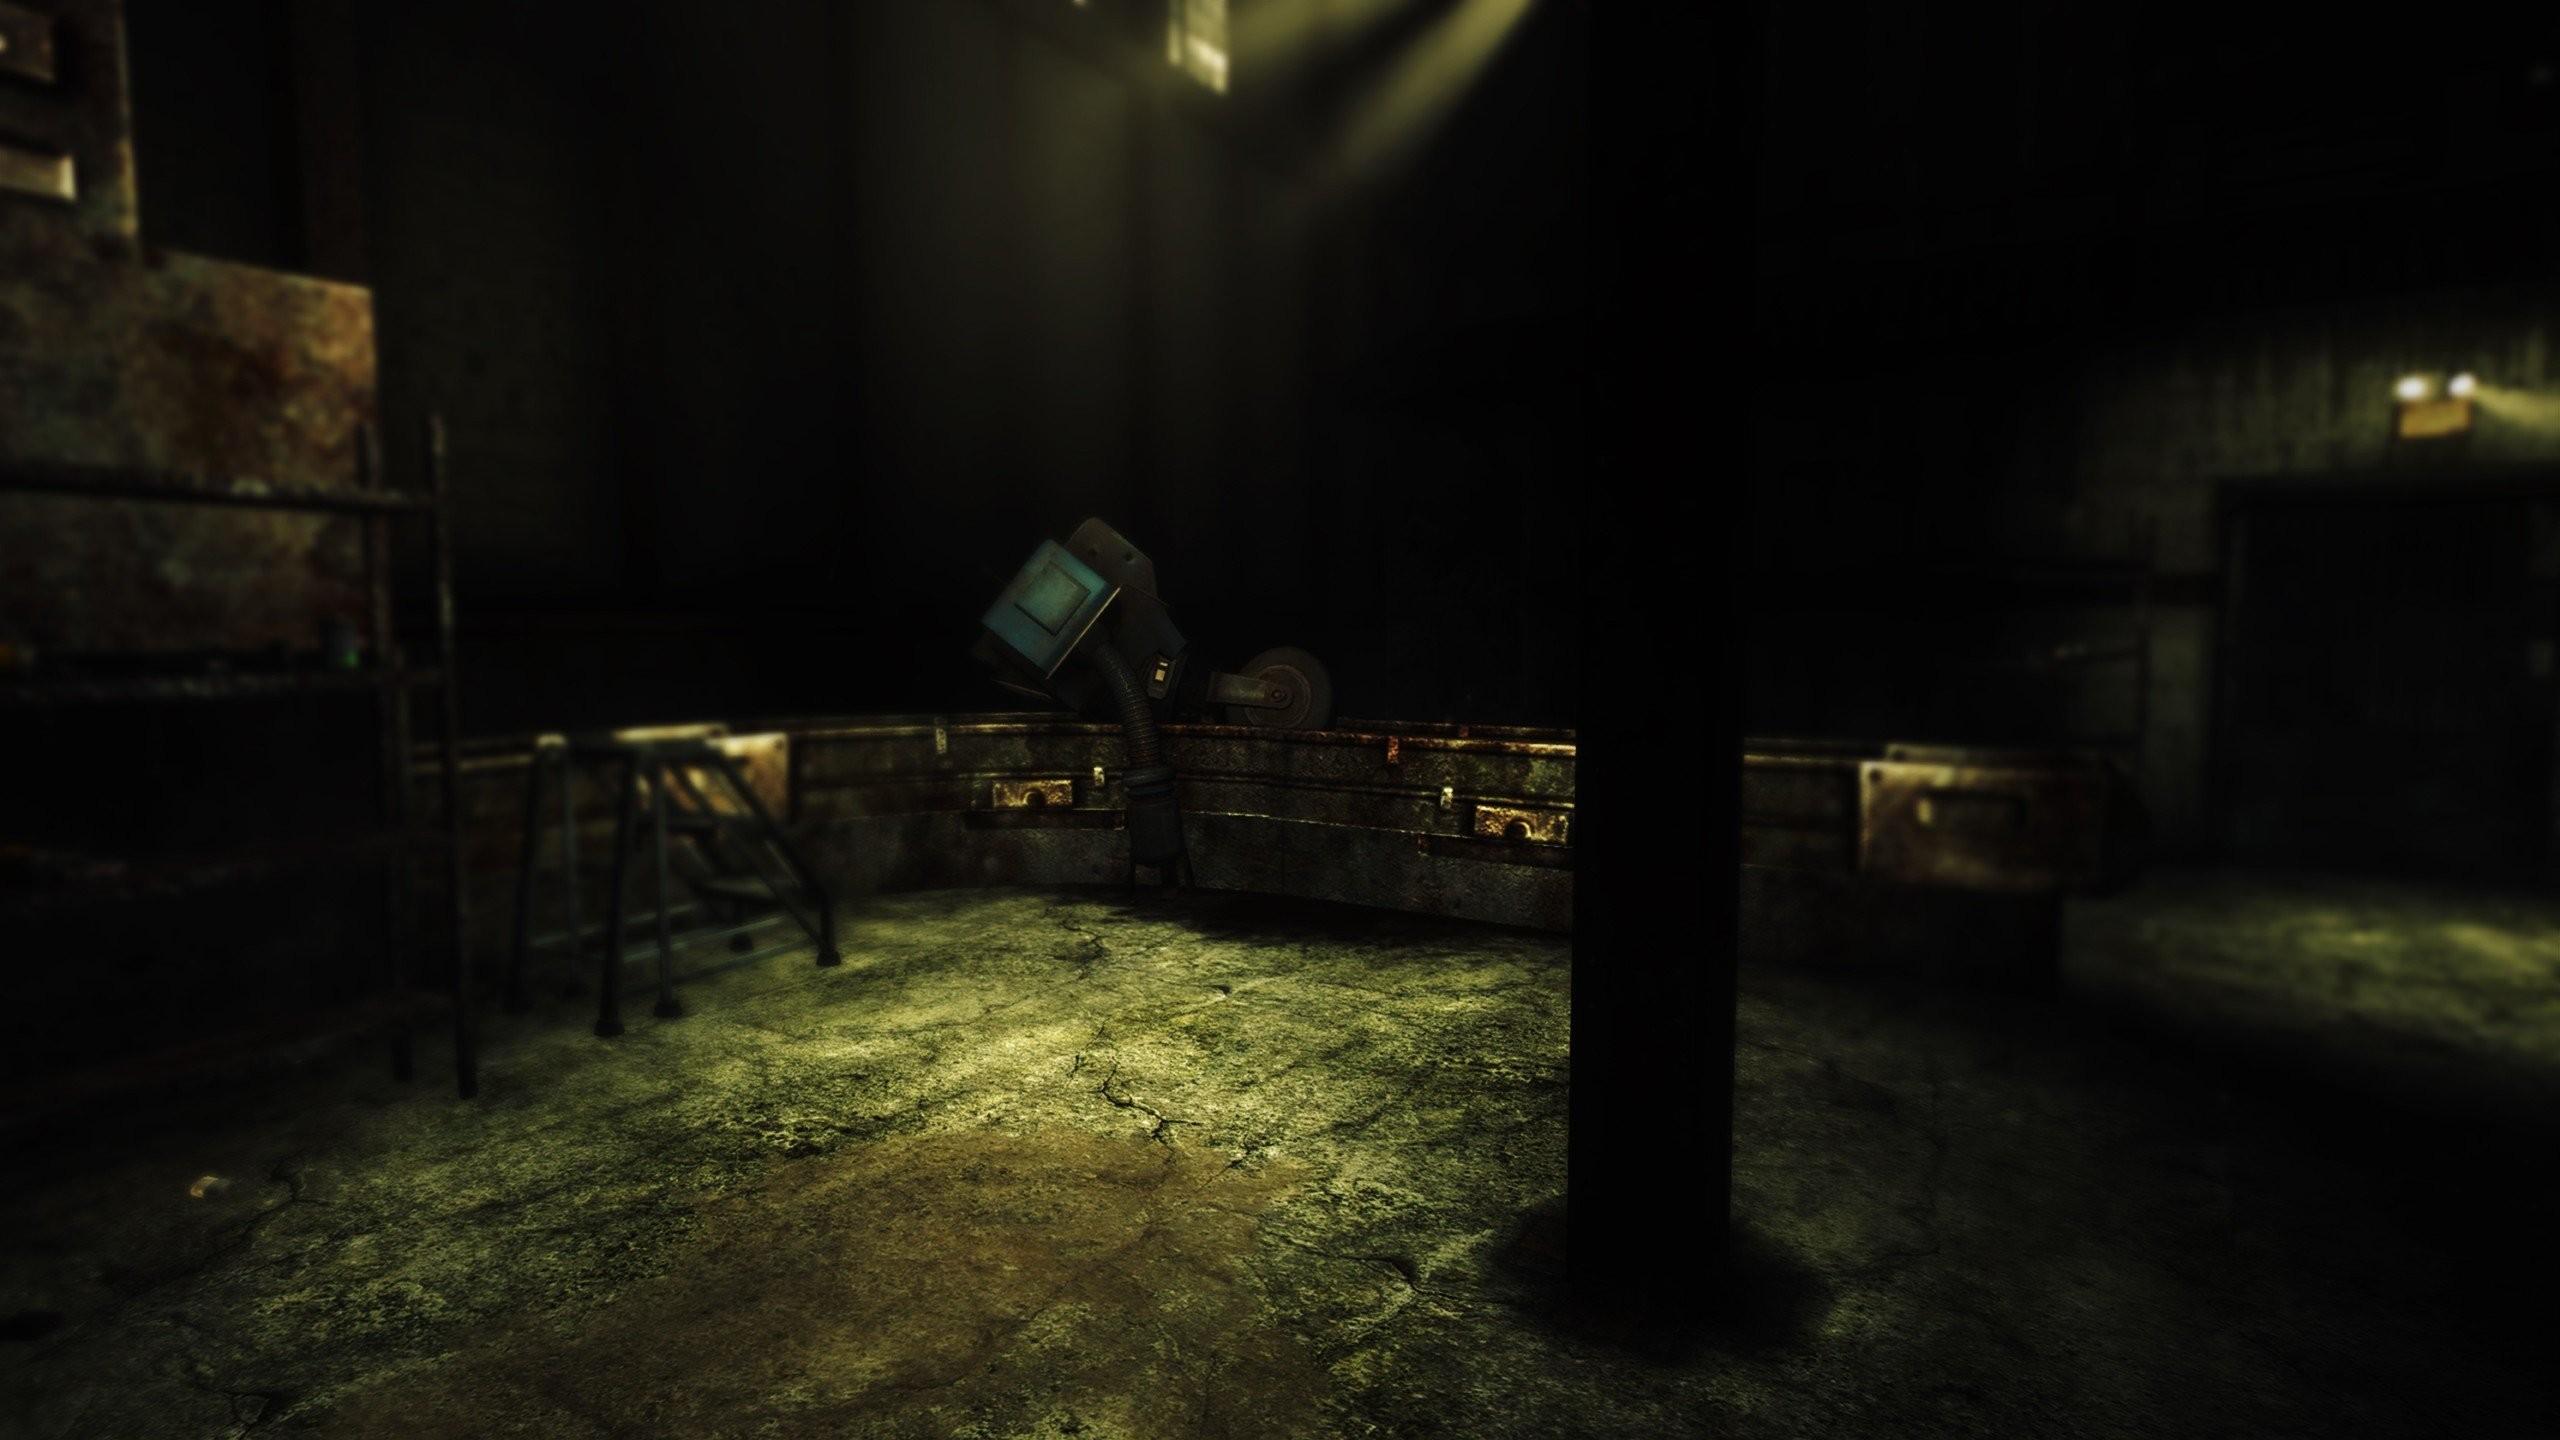 Fallout New Vegas 3 Screenshots Environment Dark Video Games ENB 1440 126894